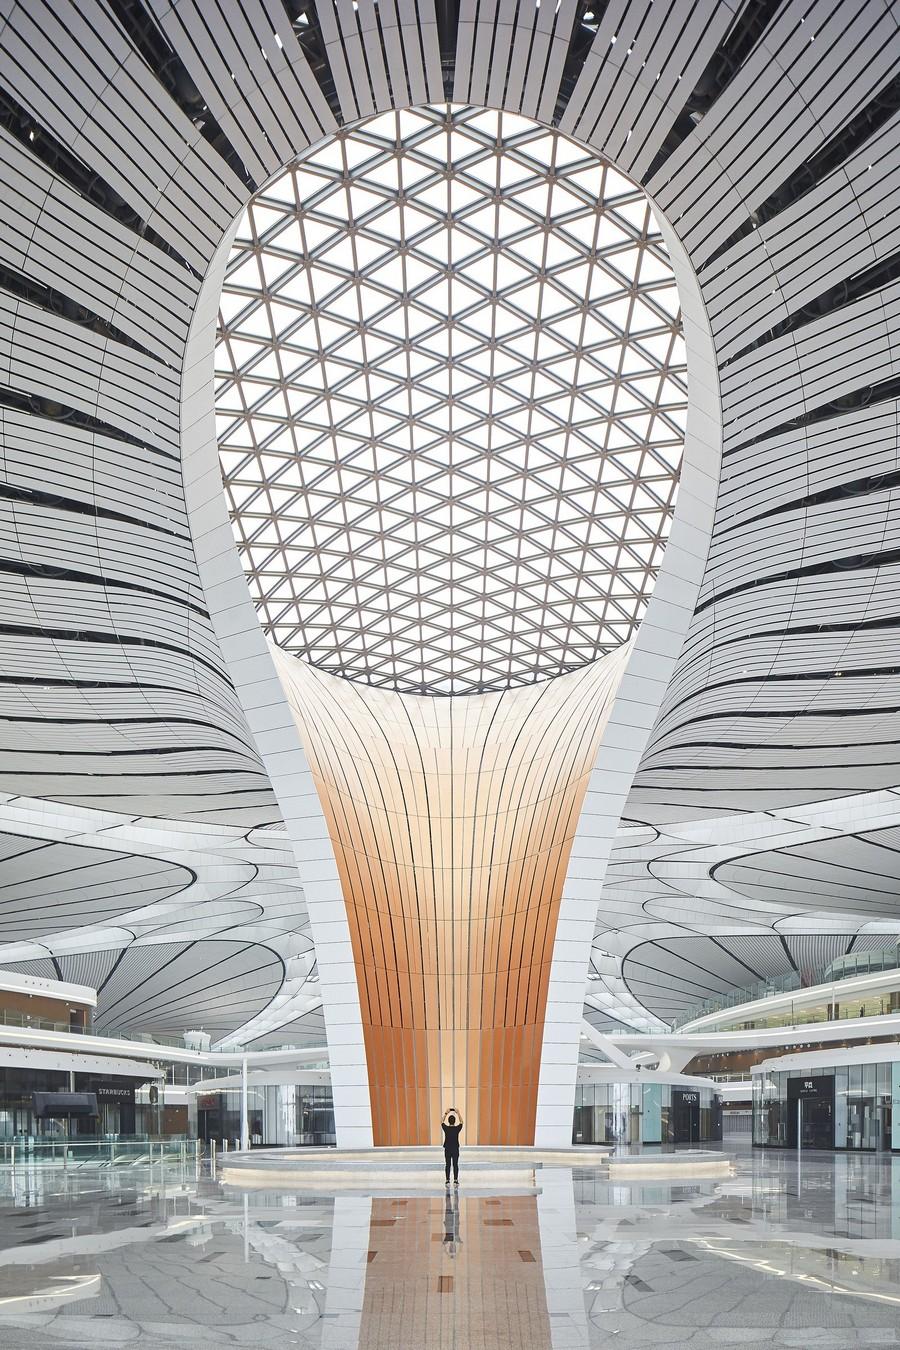 Zaha Hadid Designed The Modern Beijing Daxing International Airport zaha hadid Zaha Hadid Designed The Modern Beijing Daxing International Airport Zaha Hadid Designed The Modern Beijing Daxing International Airport 5